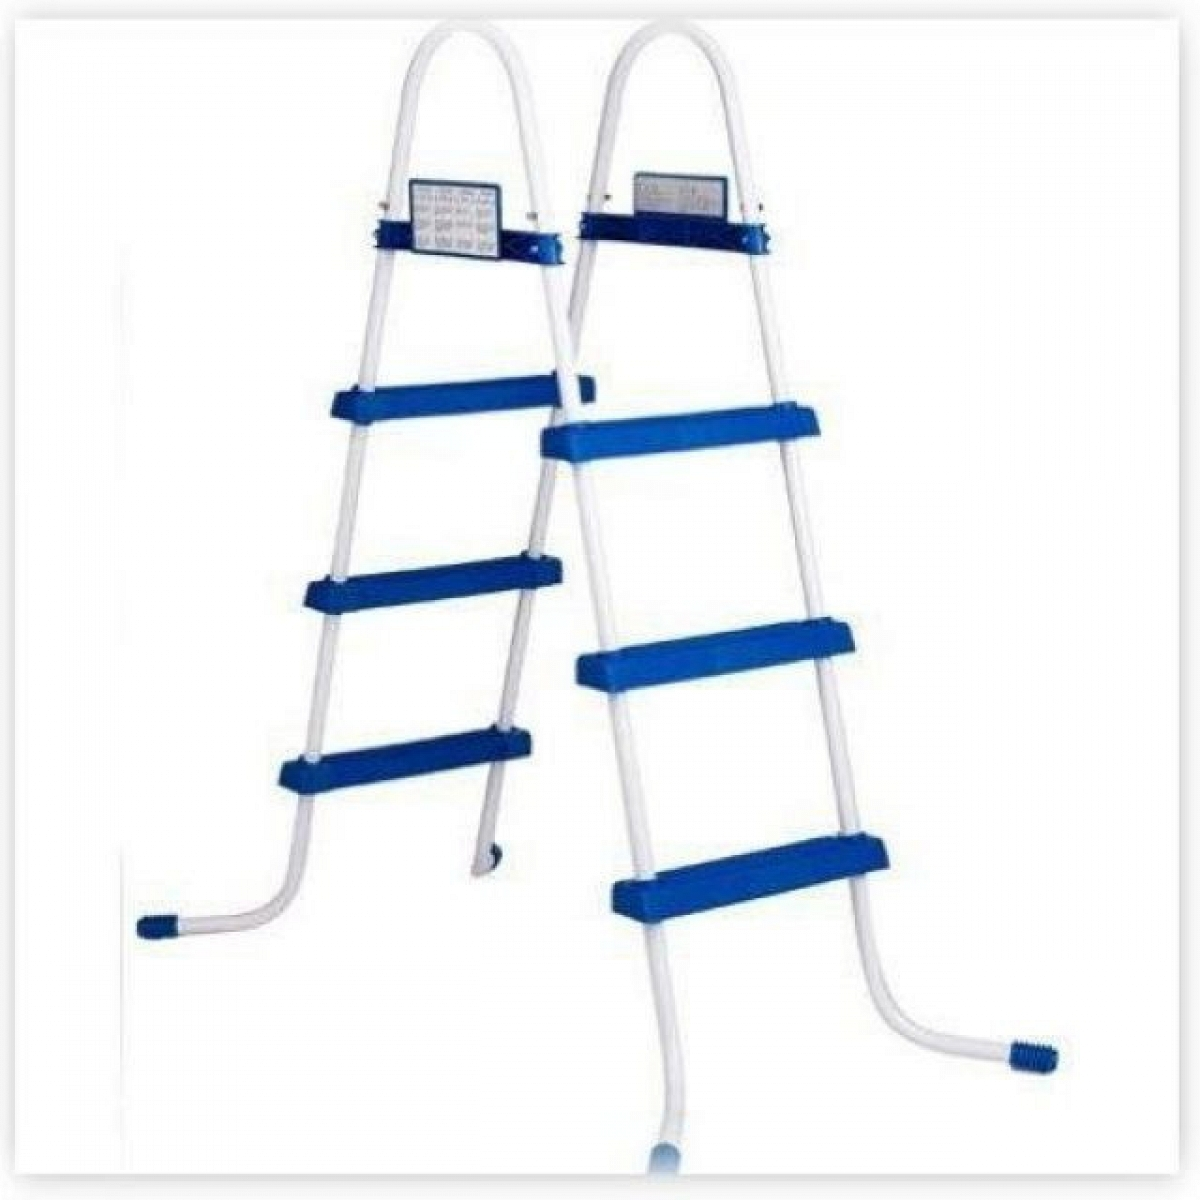 Scala per piscine bestway 132 bestway accessori piscine in for Bestway piscine e accessori